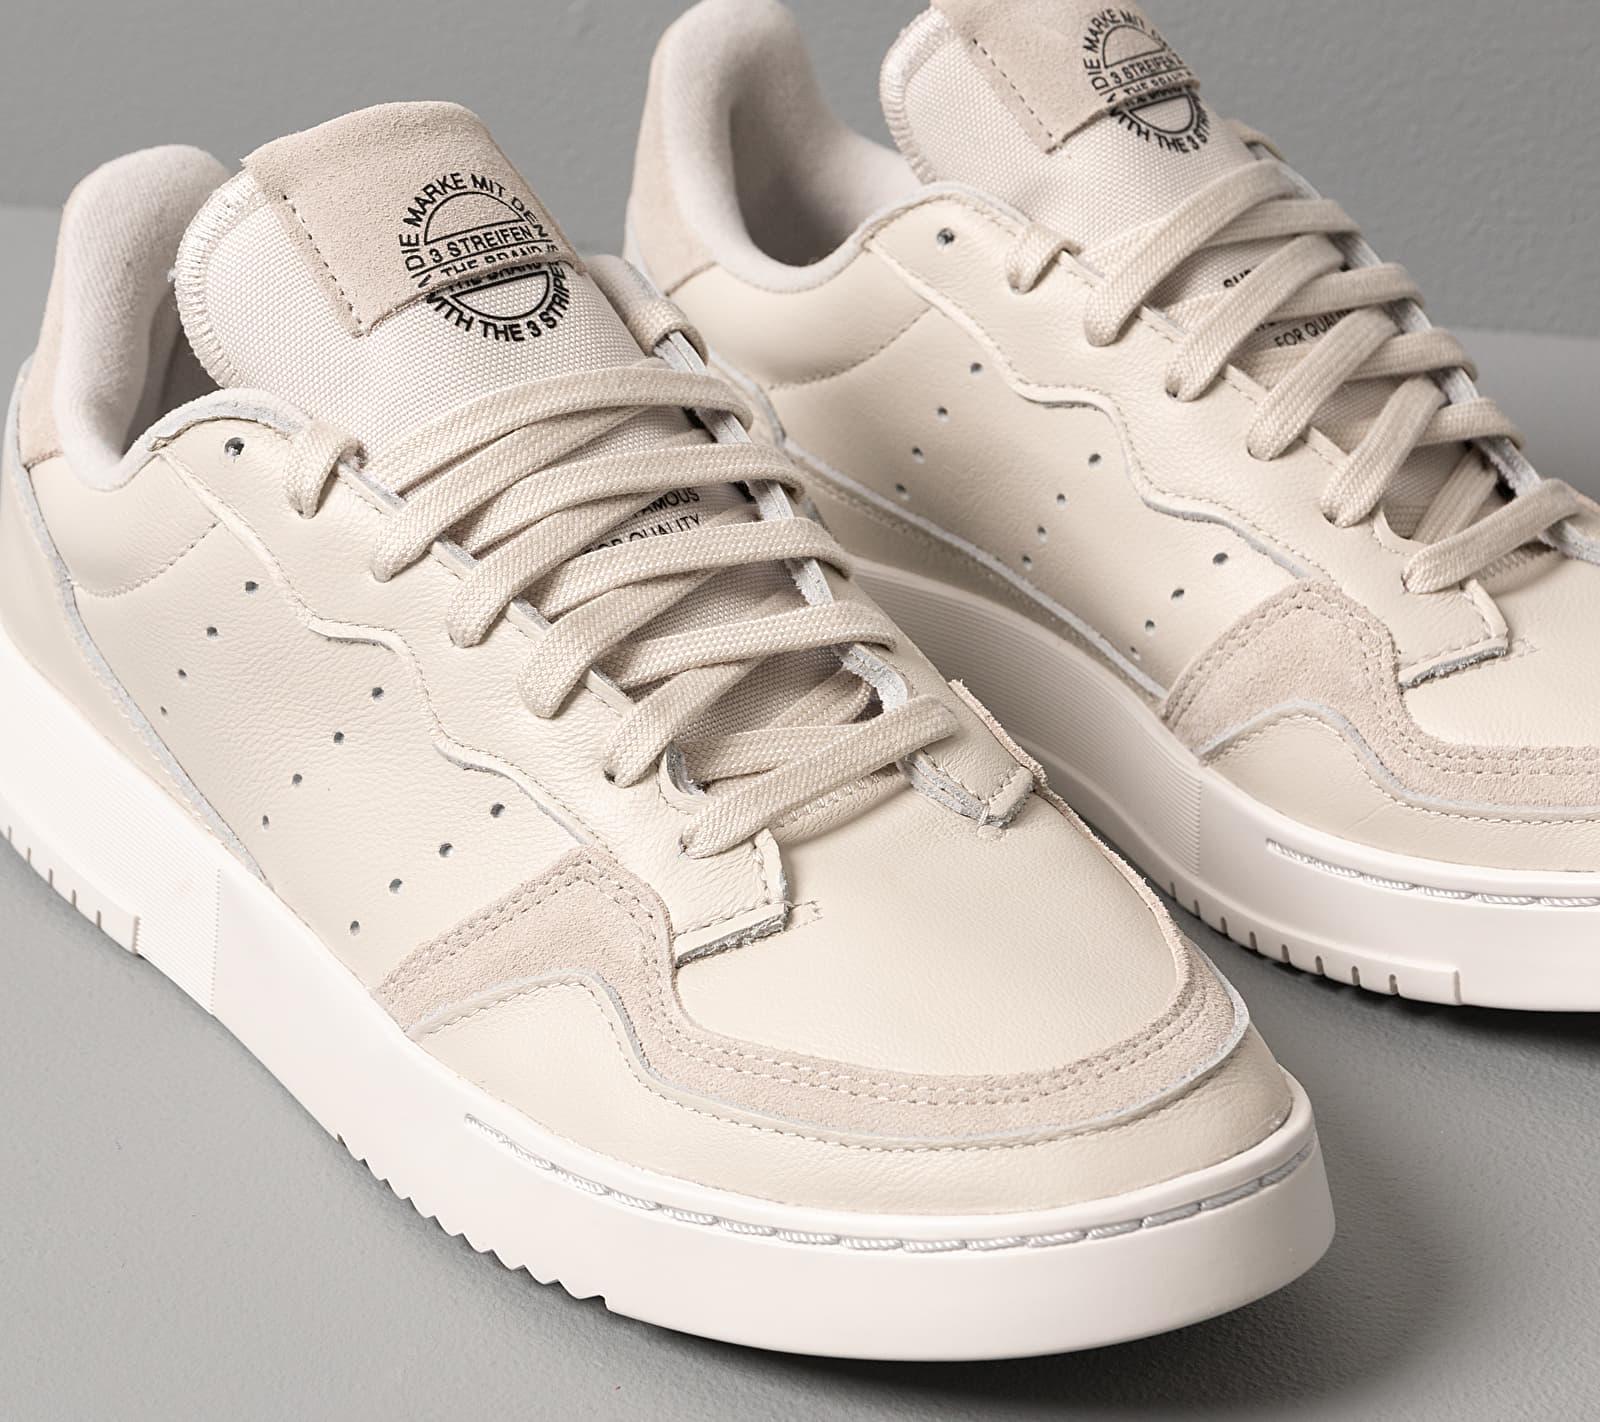 adidas Supercourt Raw White/ Raw White